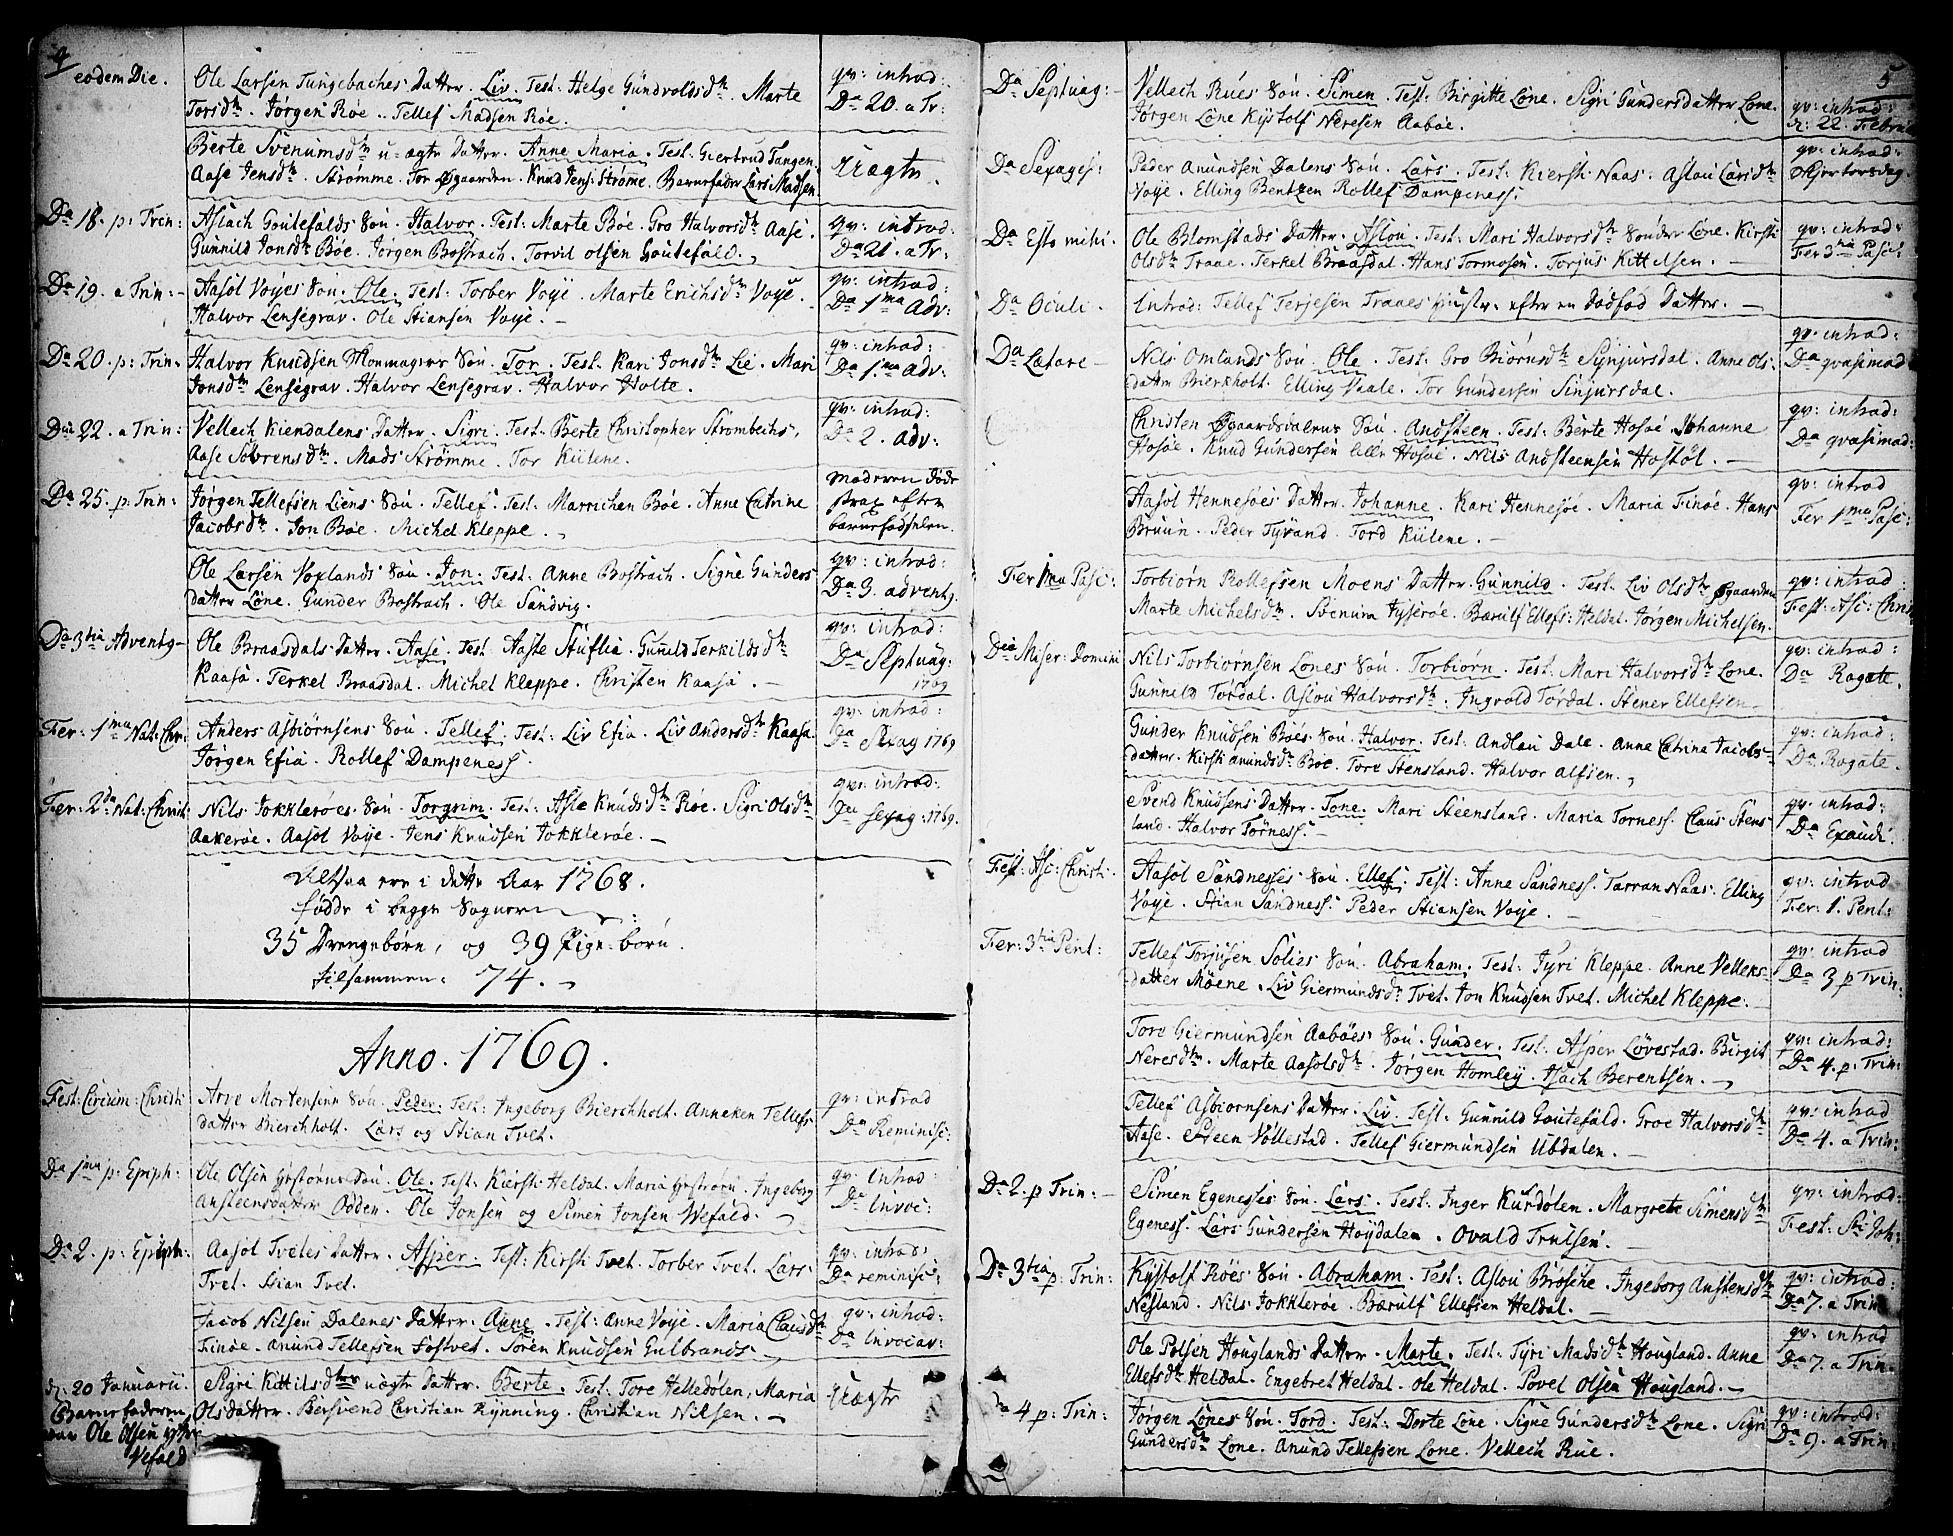 SAKO, Drangedal kirkebøker, F/Fa/L0003: Ministerialbok nr. 3, 1768-1814, s. 4-5